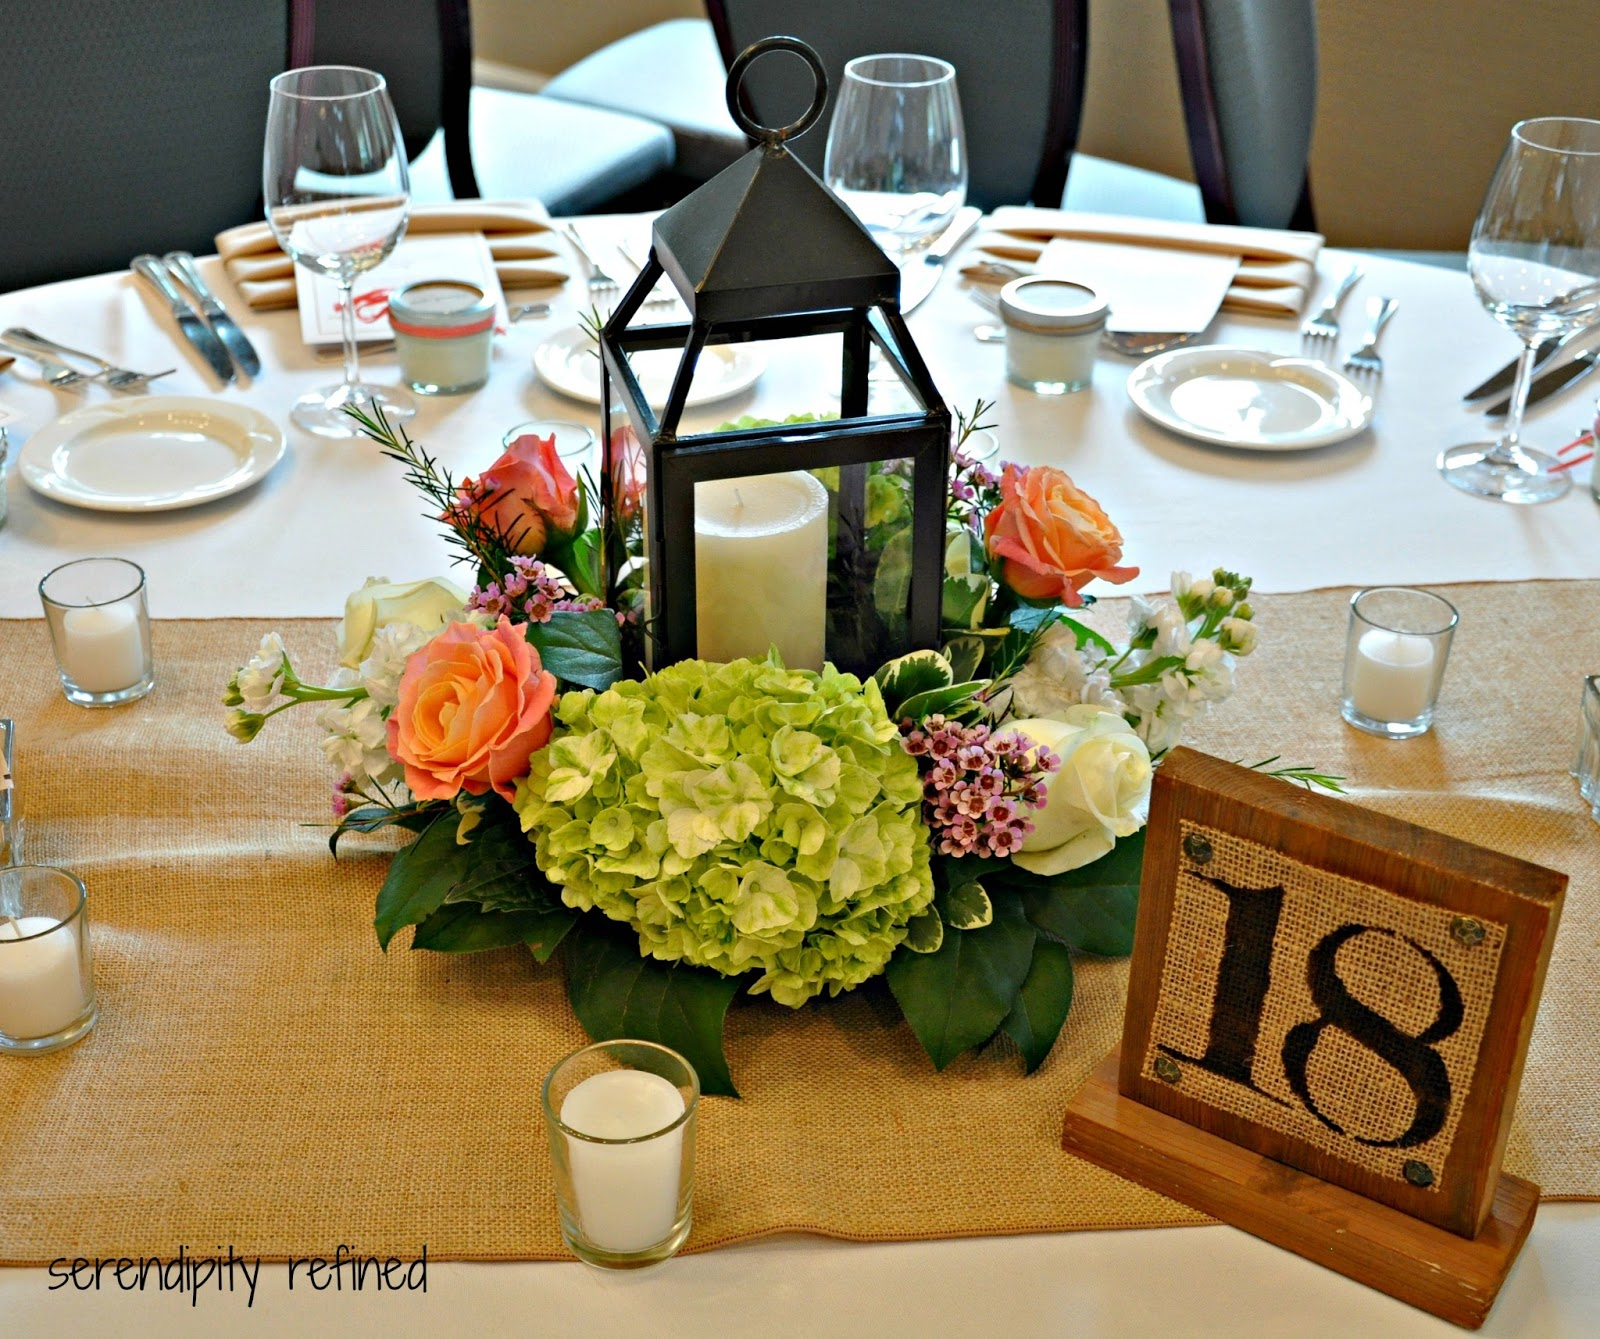 Serendipity Refined Blog: Wonderful Saturday Wedding